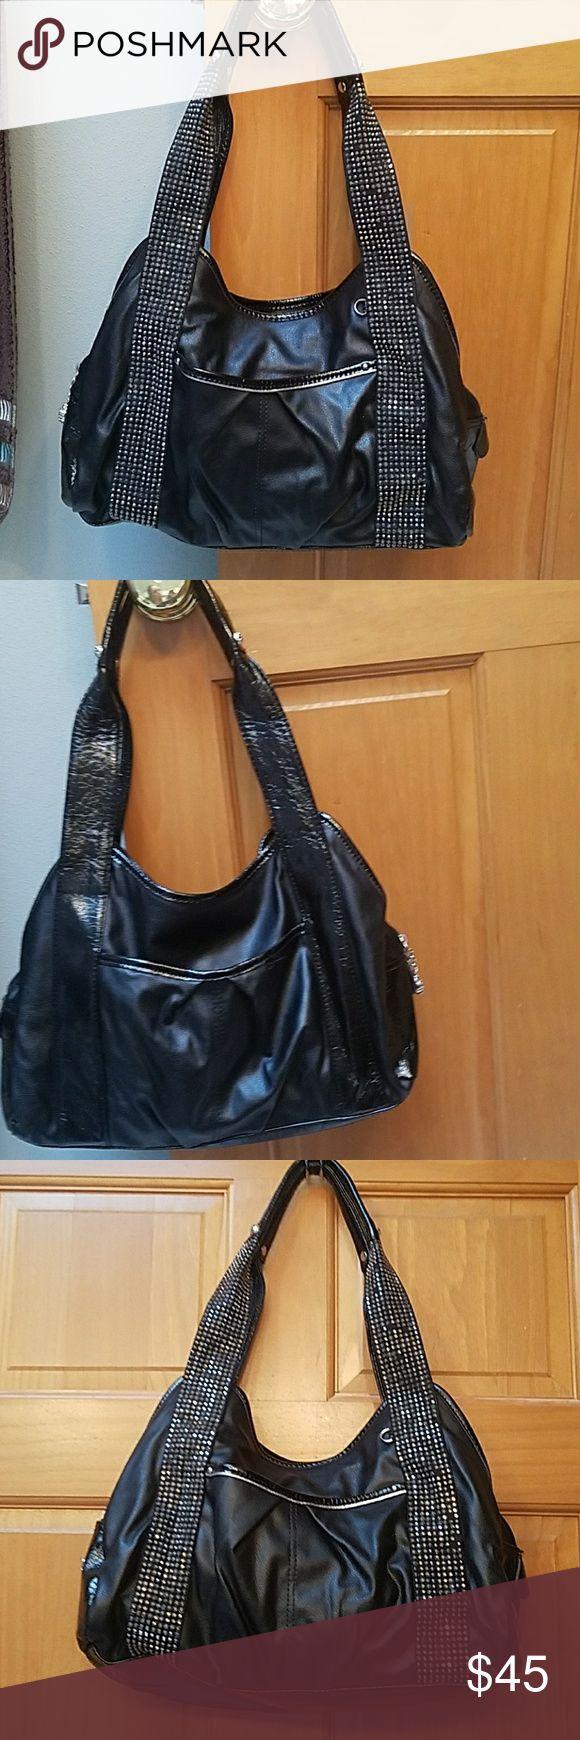 Kathy Van Zeeland black purse with silver accents. Cute black purse with silver embellishments. In great condition. Offers welcome. Kathy Van Zeeland Bags Shoulder Bags